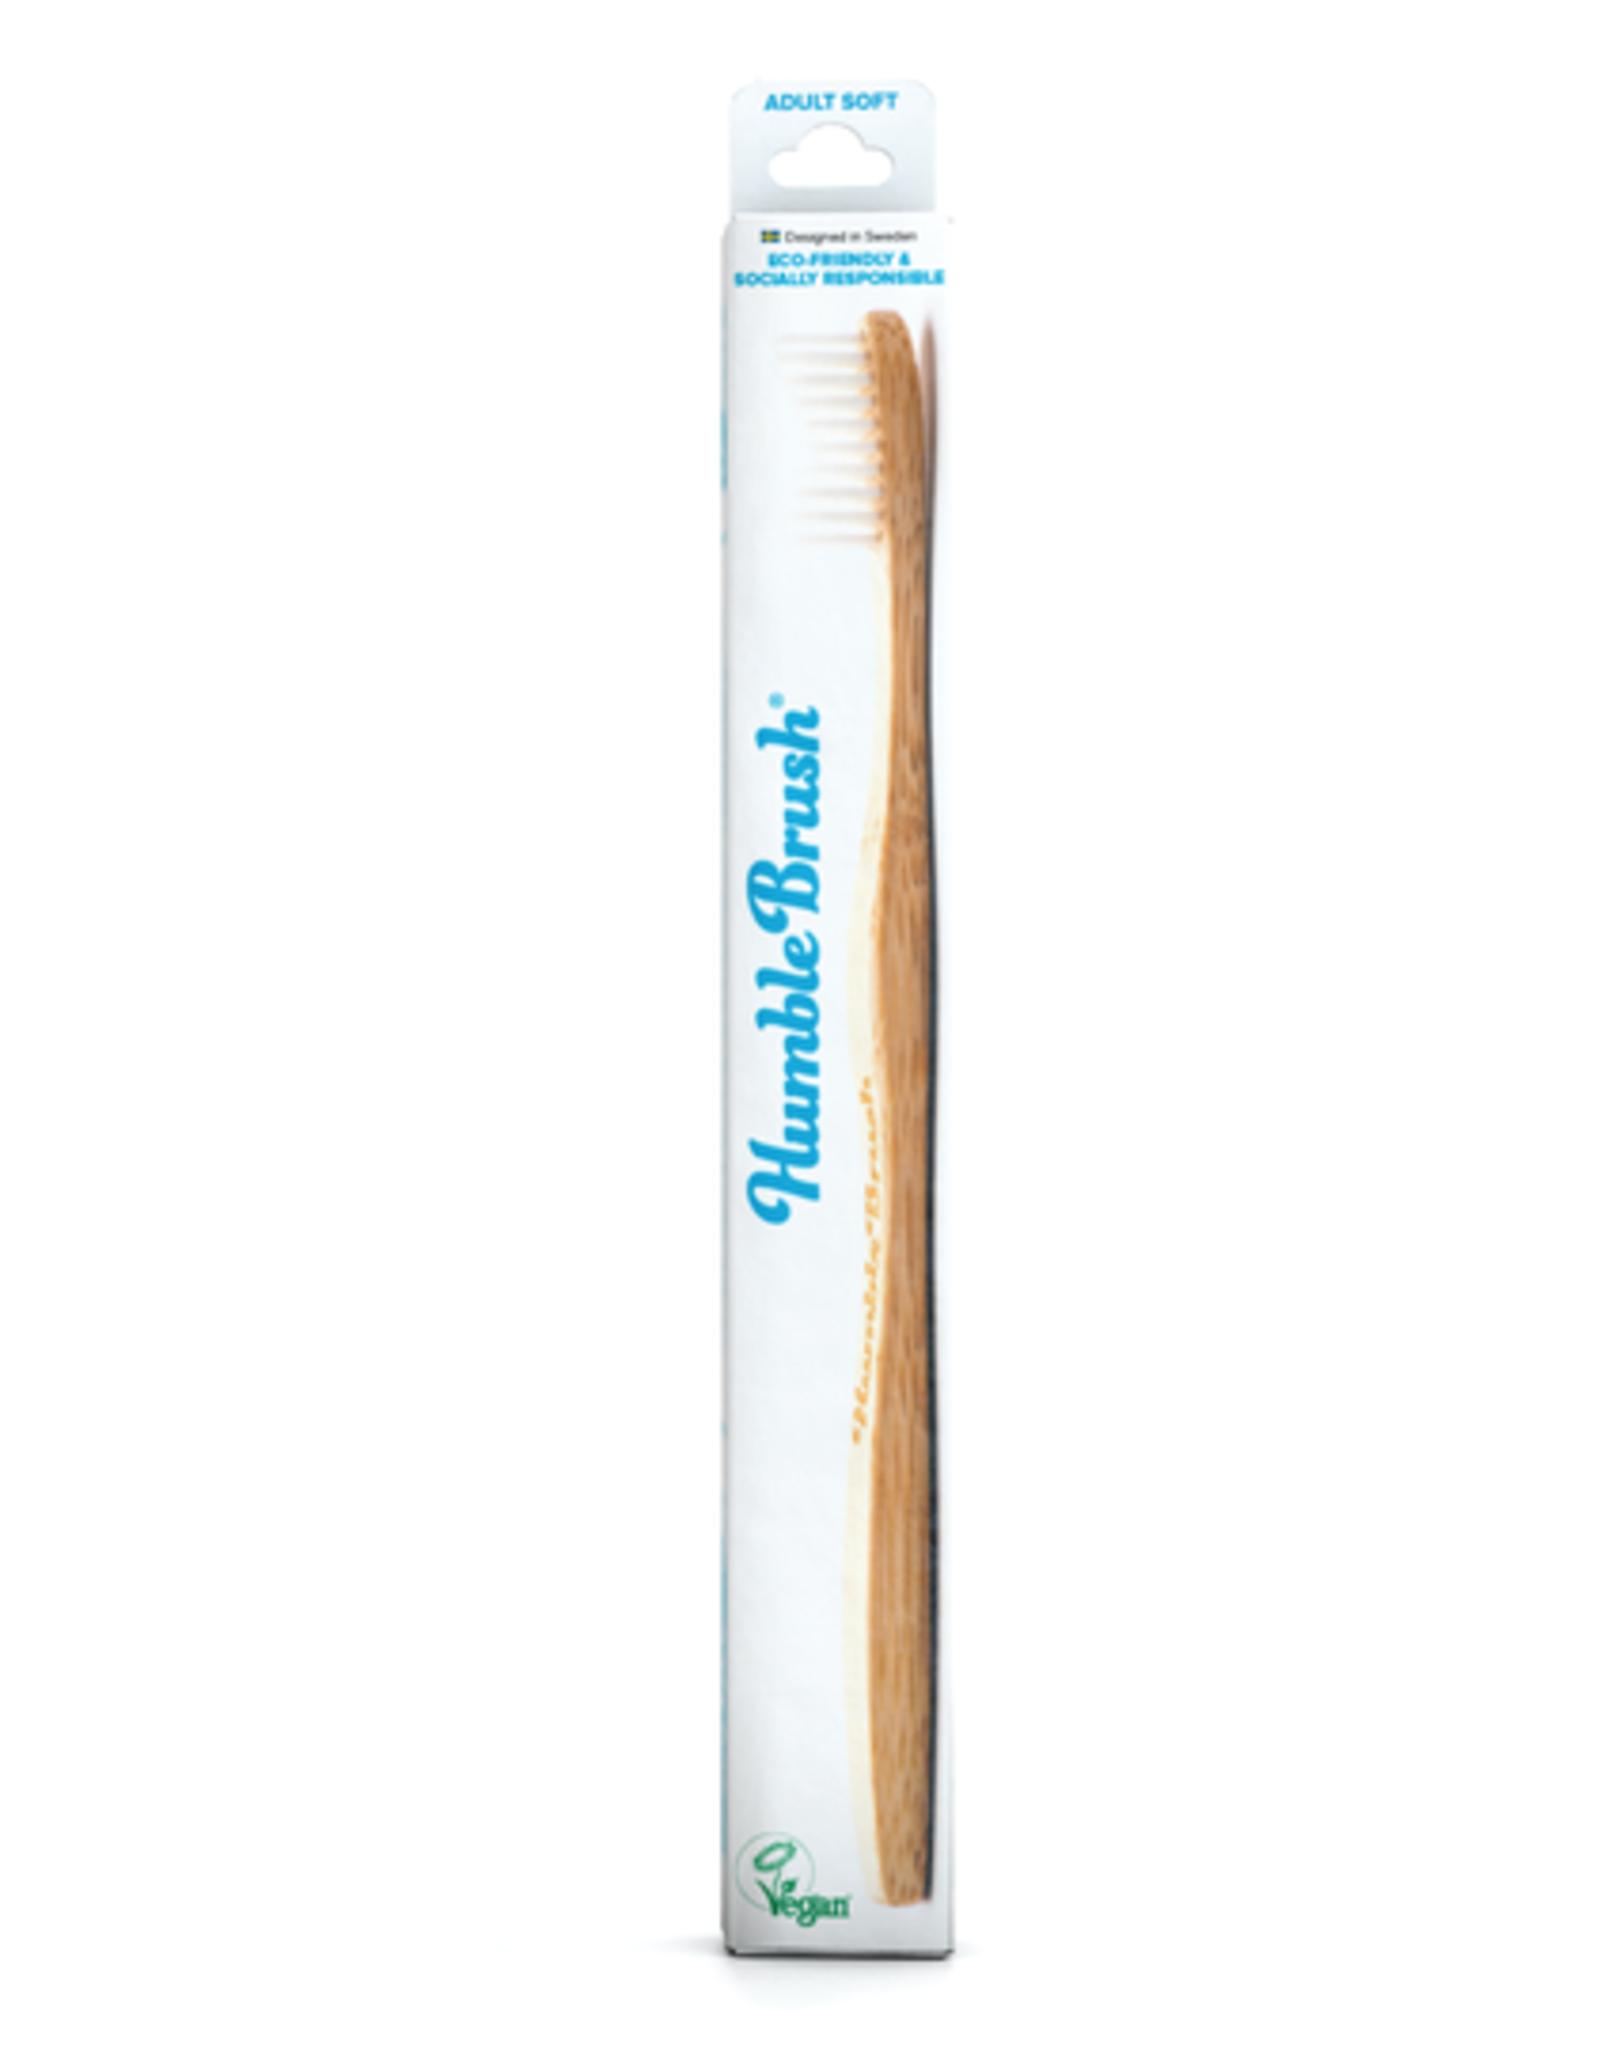 The Humble Co. Humble Brush Toothbrush White Ultra Soft